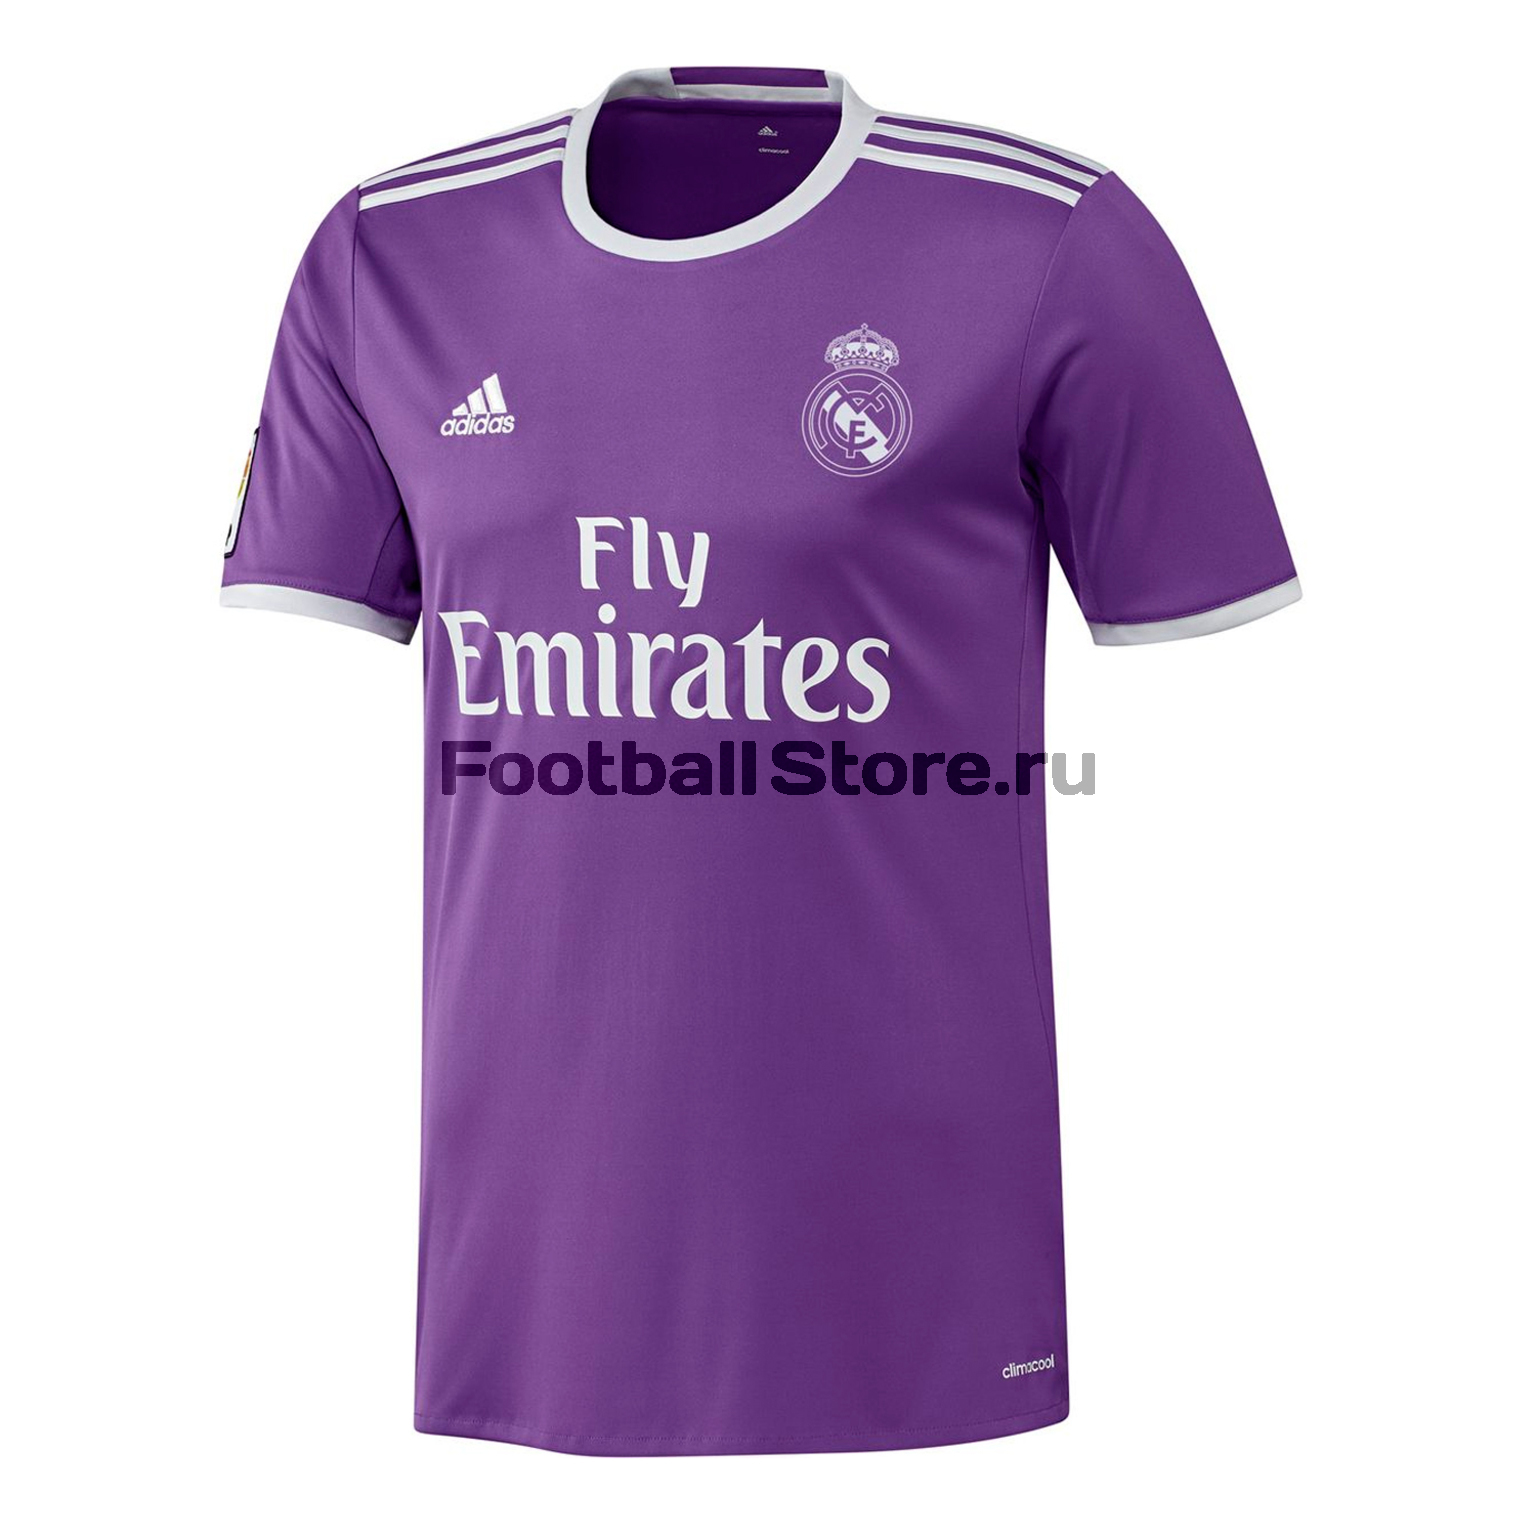 Real Madrid Adidas Футболка игровая Adidas Real Madrid Away AI5158 adidas футболка russia away